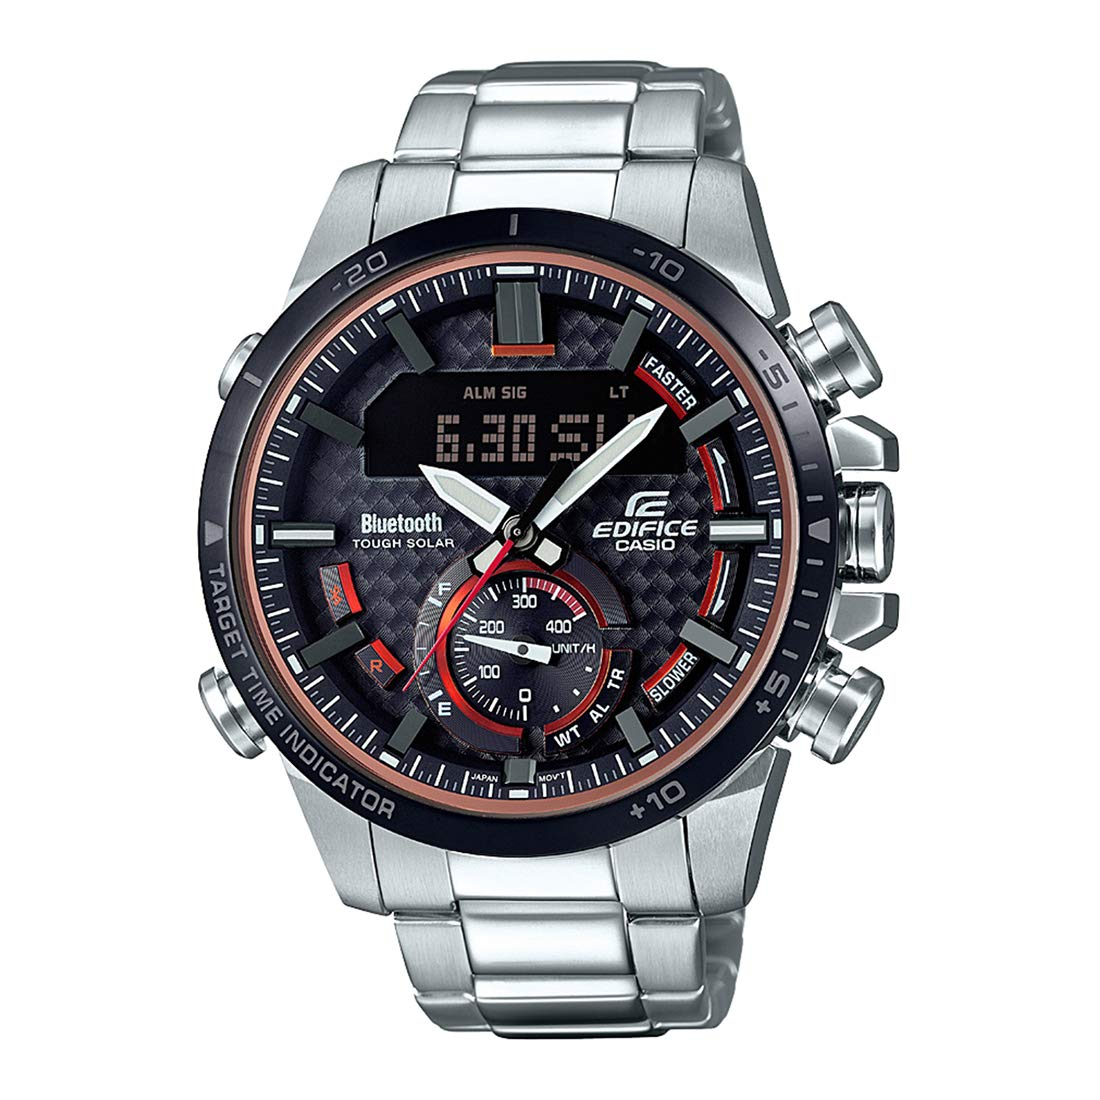 Top 10 Best Watches For Men Under 20000 In India 2021